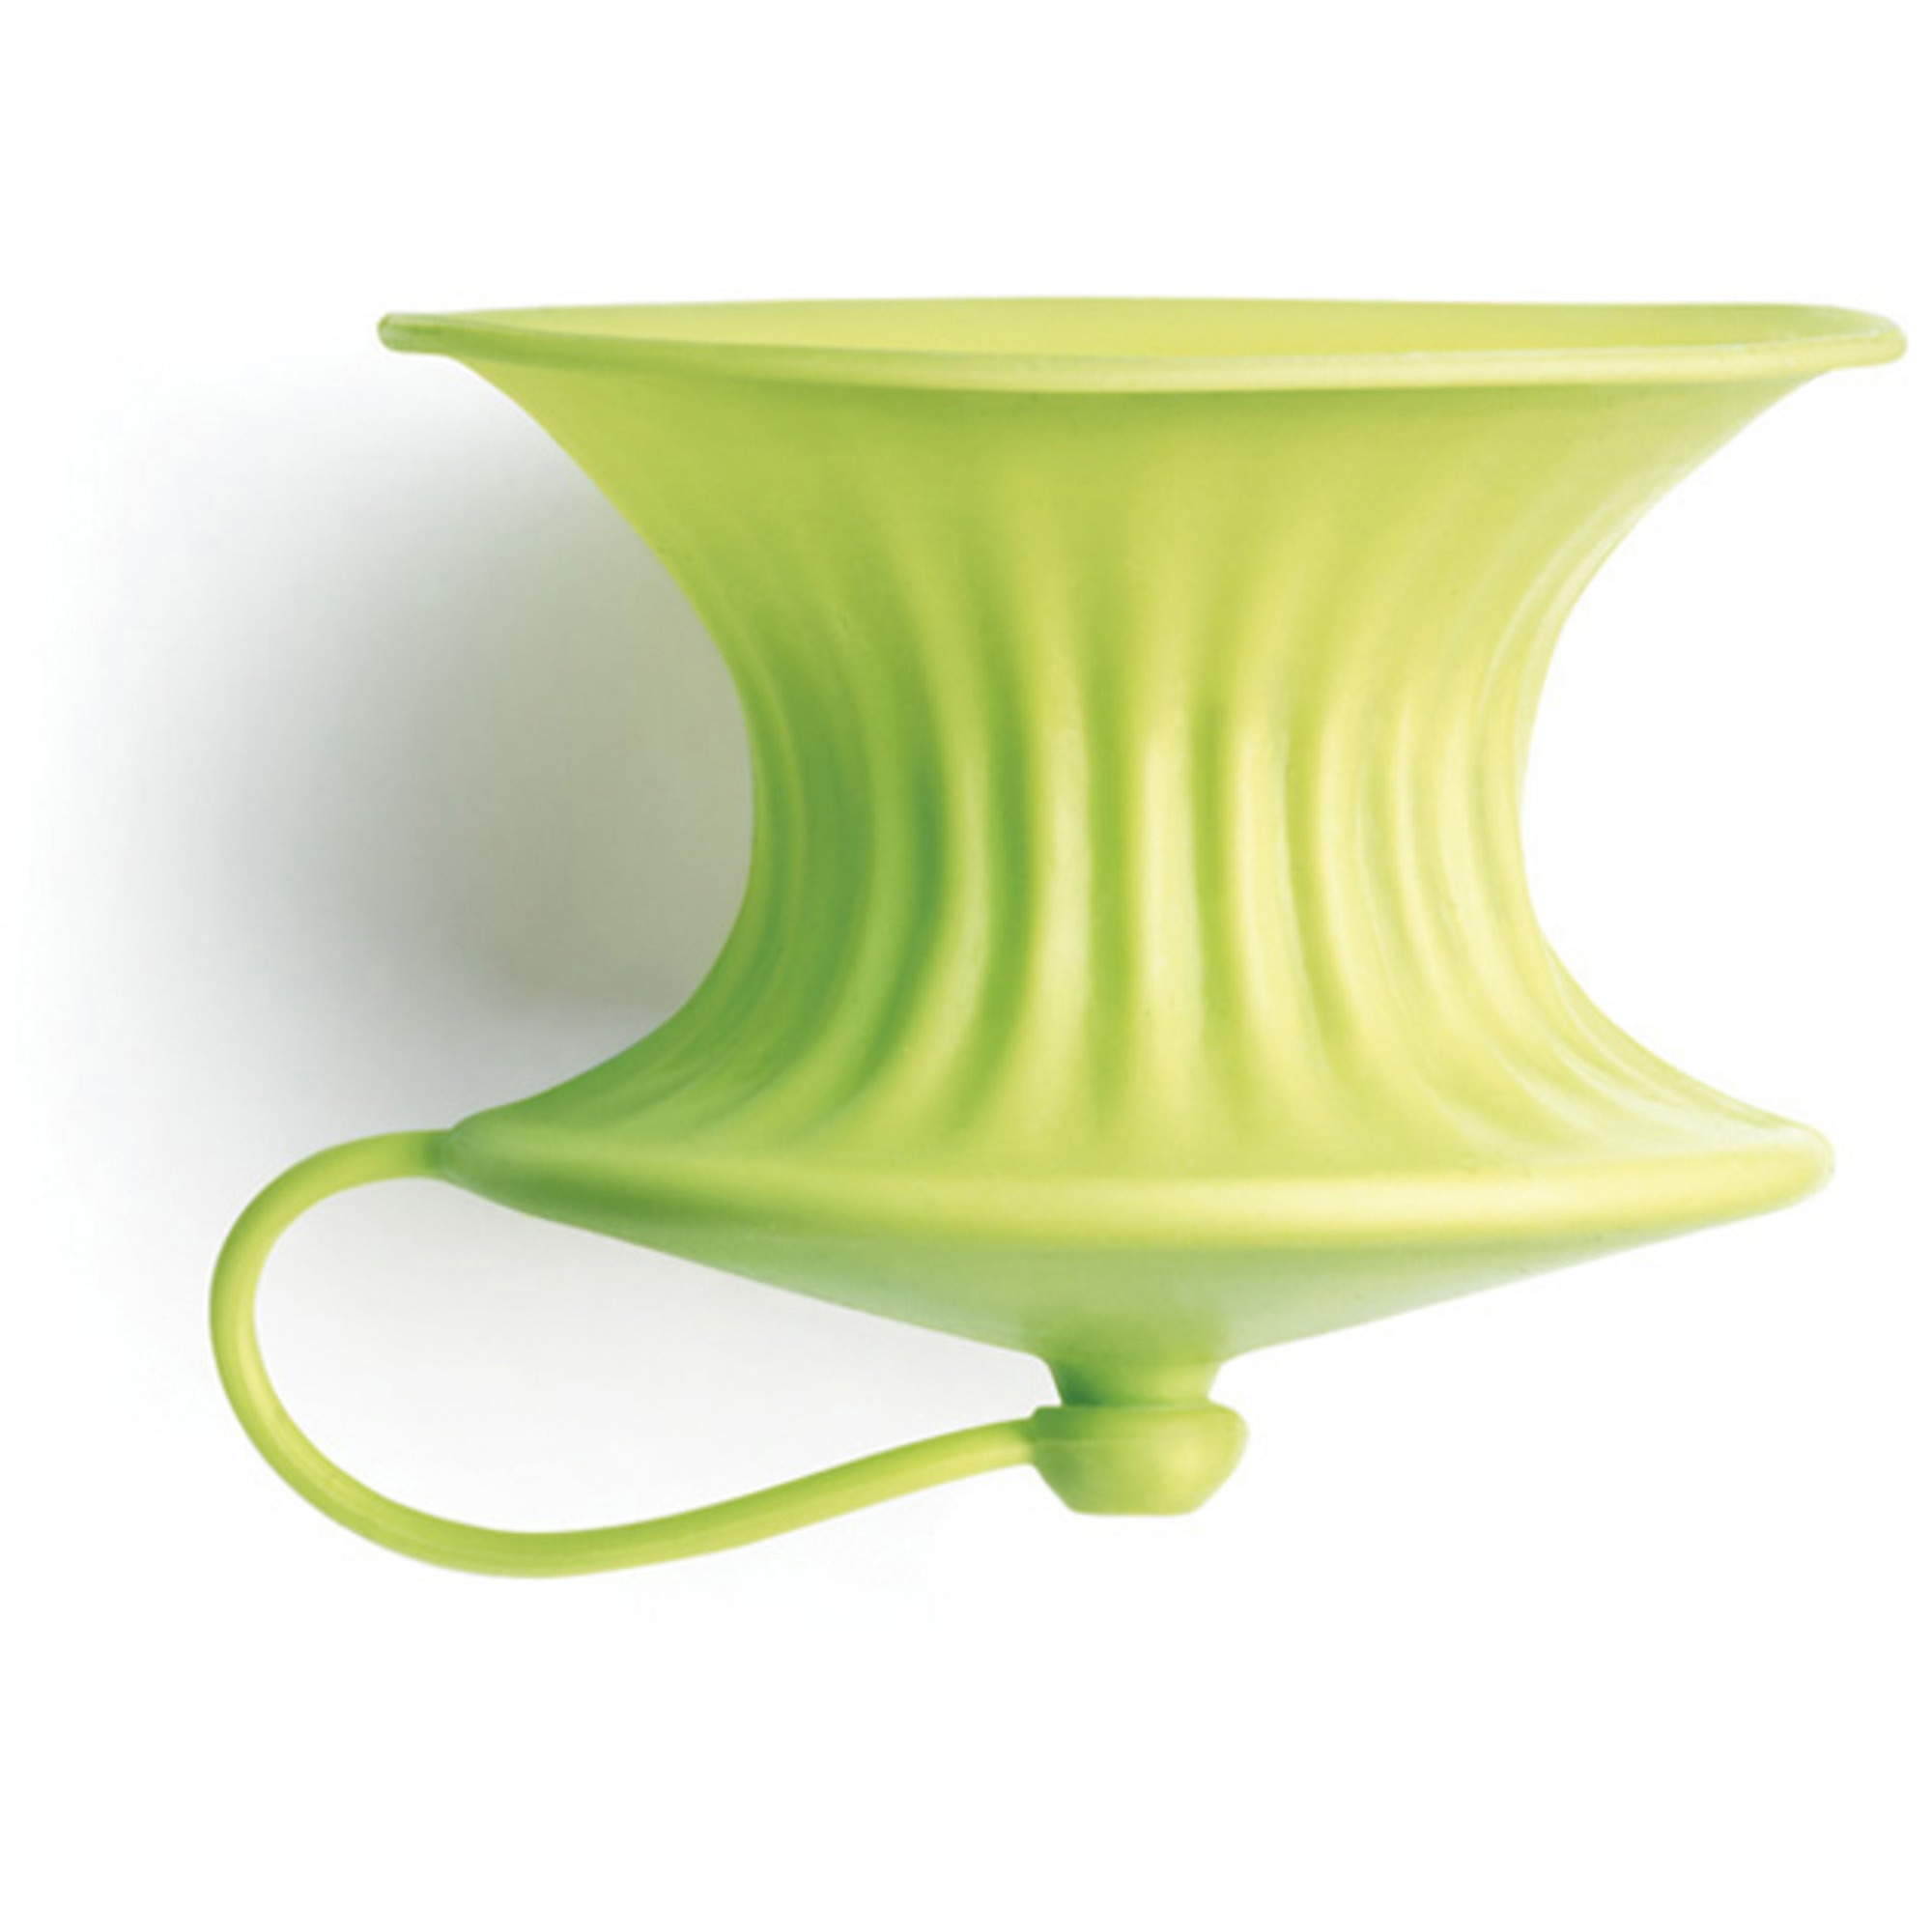 Lékué Citronpress i silikon 2-pack limegrön